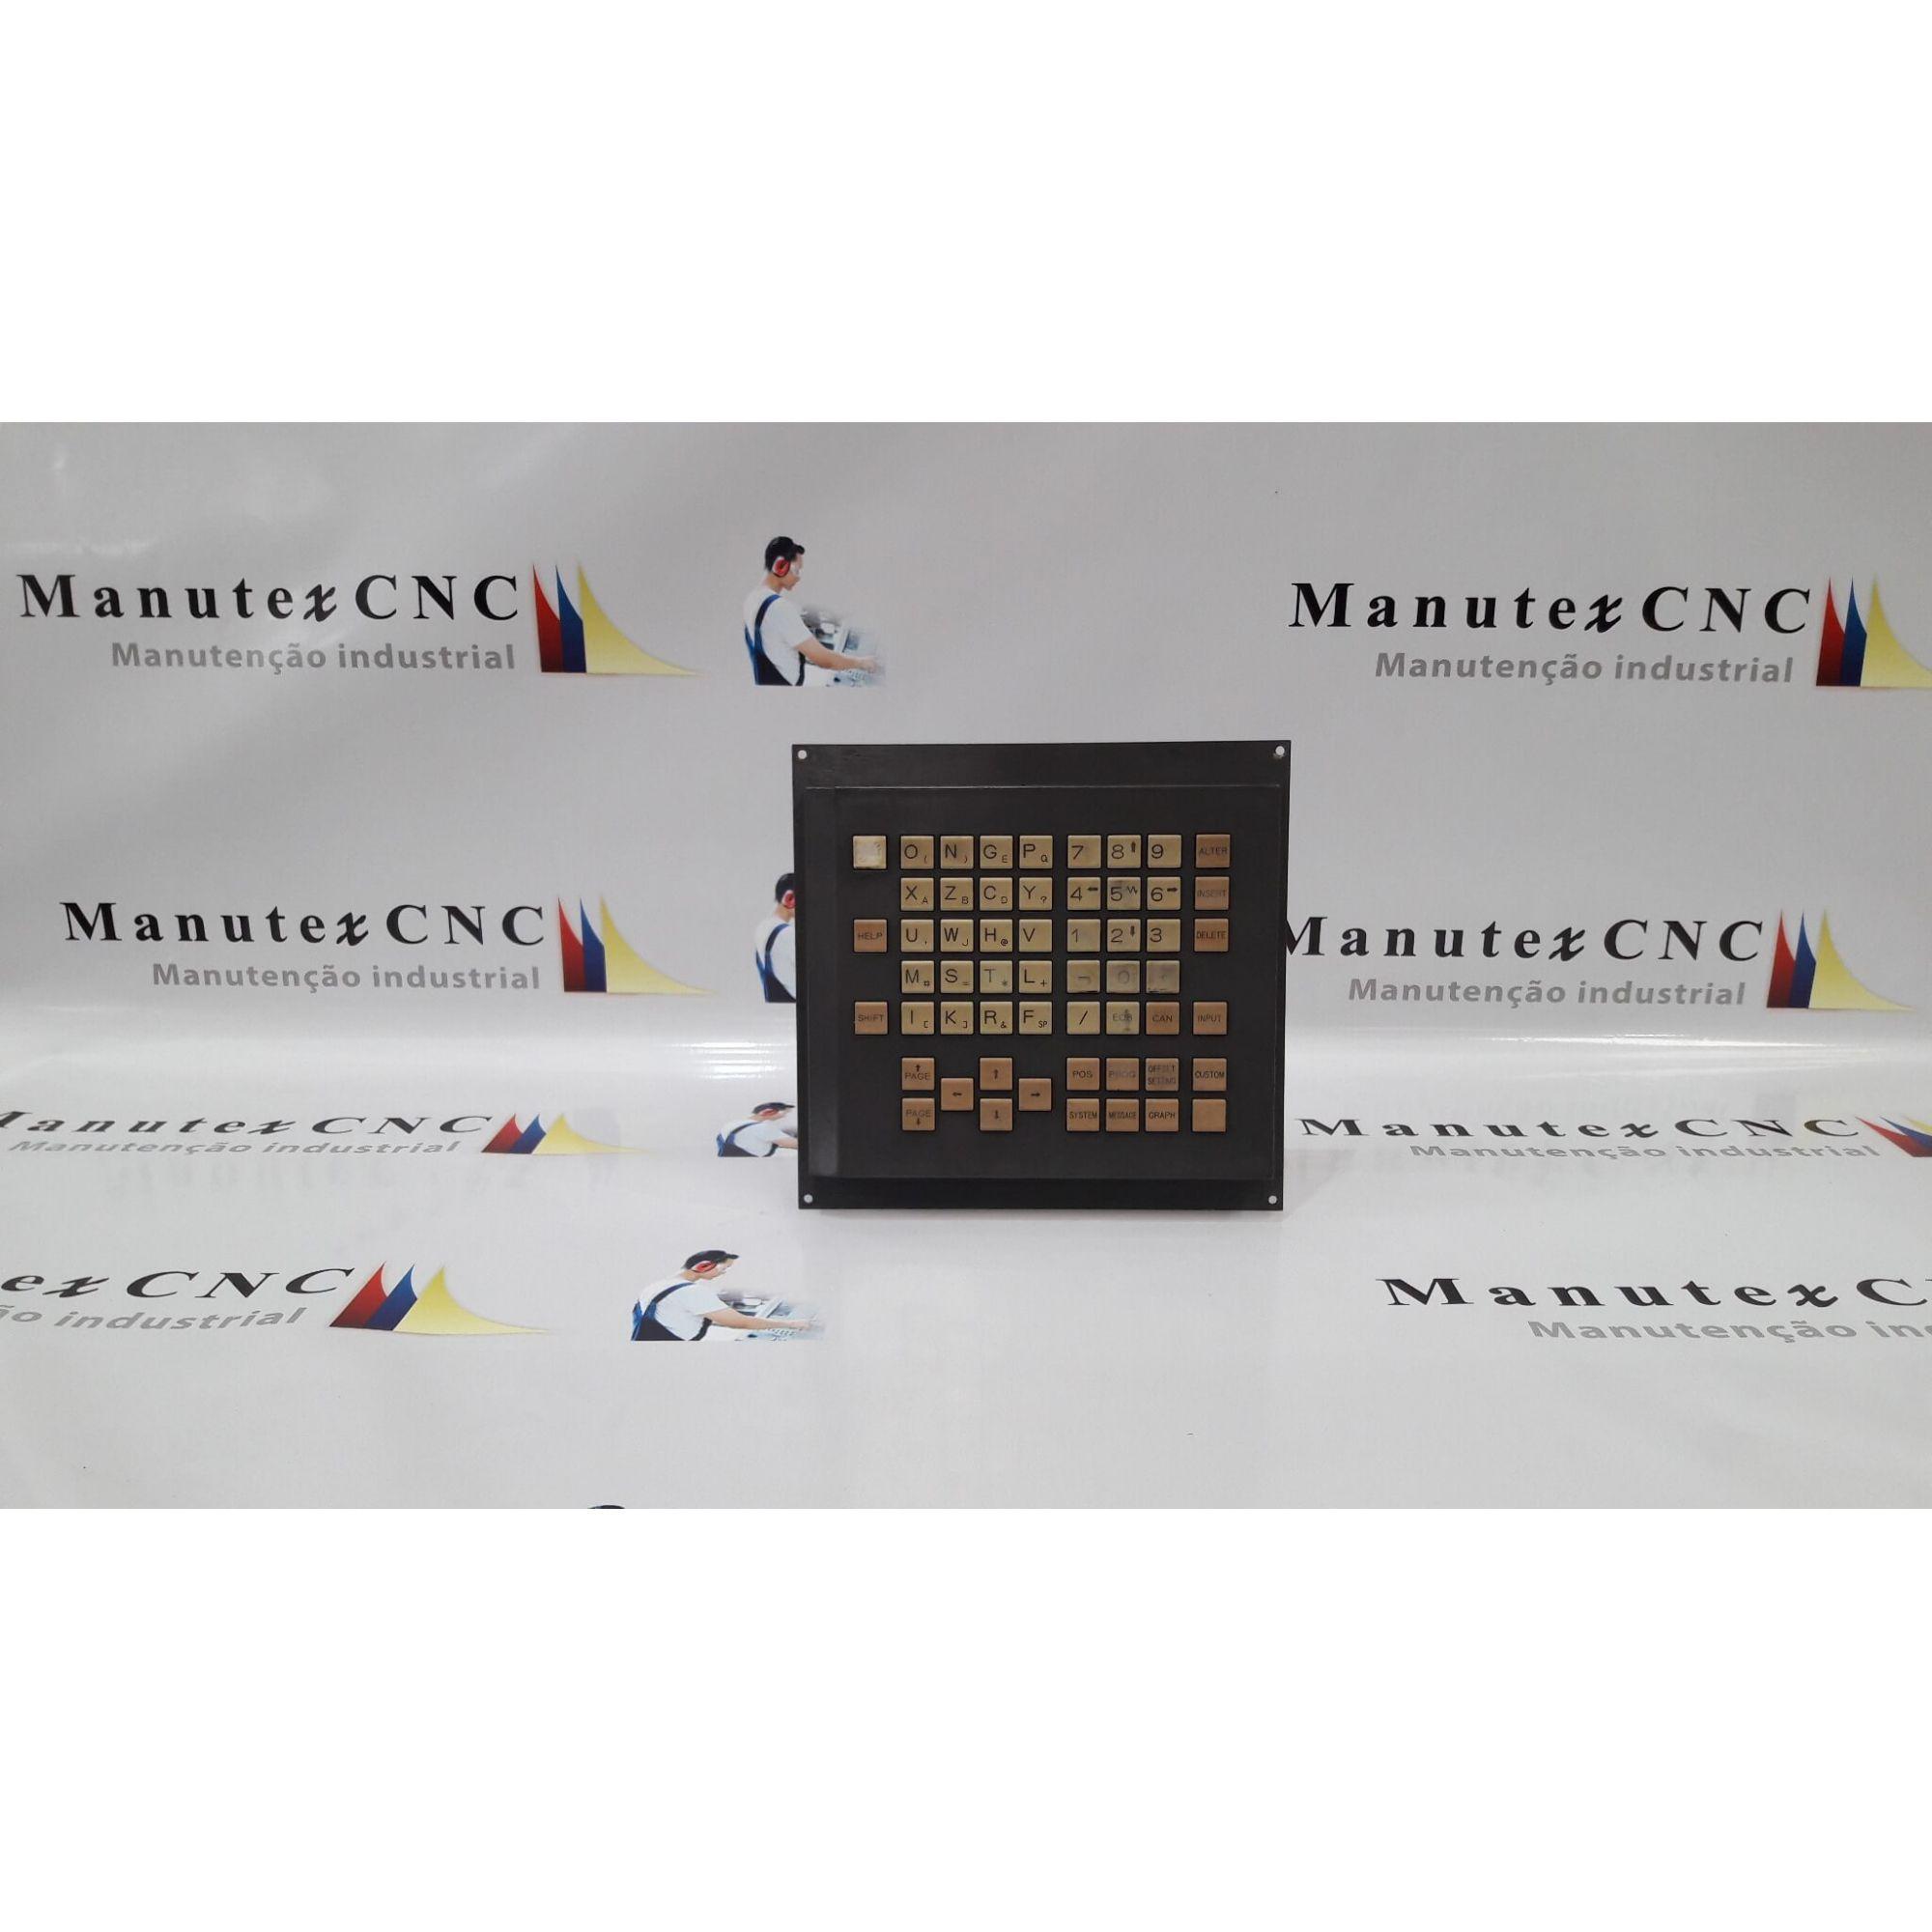 A02B-0236-C125/TBR | TECLADO MDI CNC | FANUC